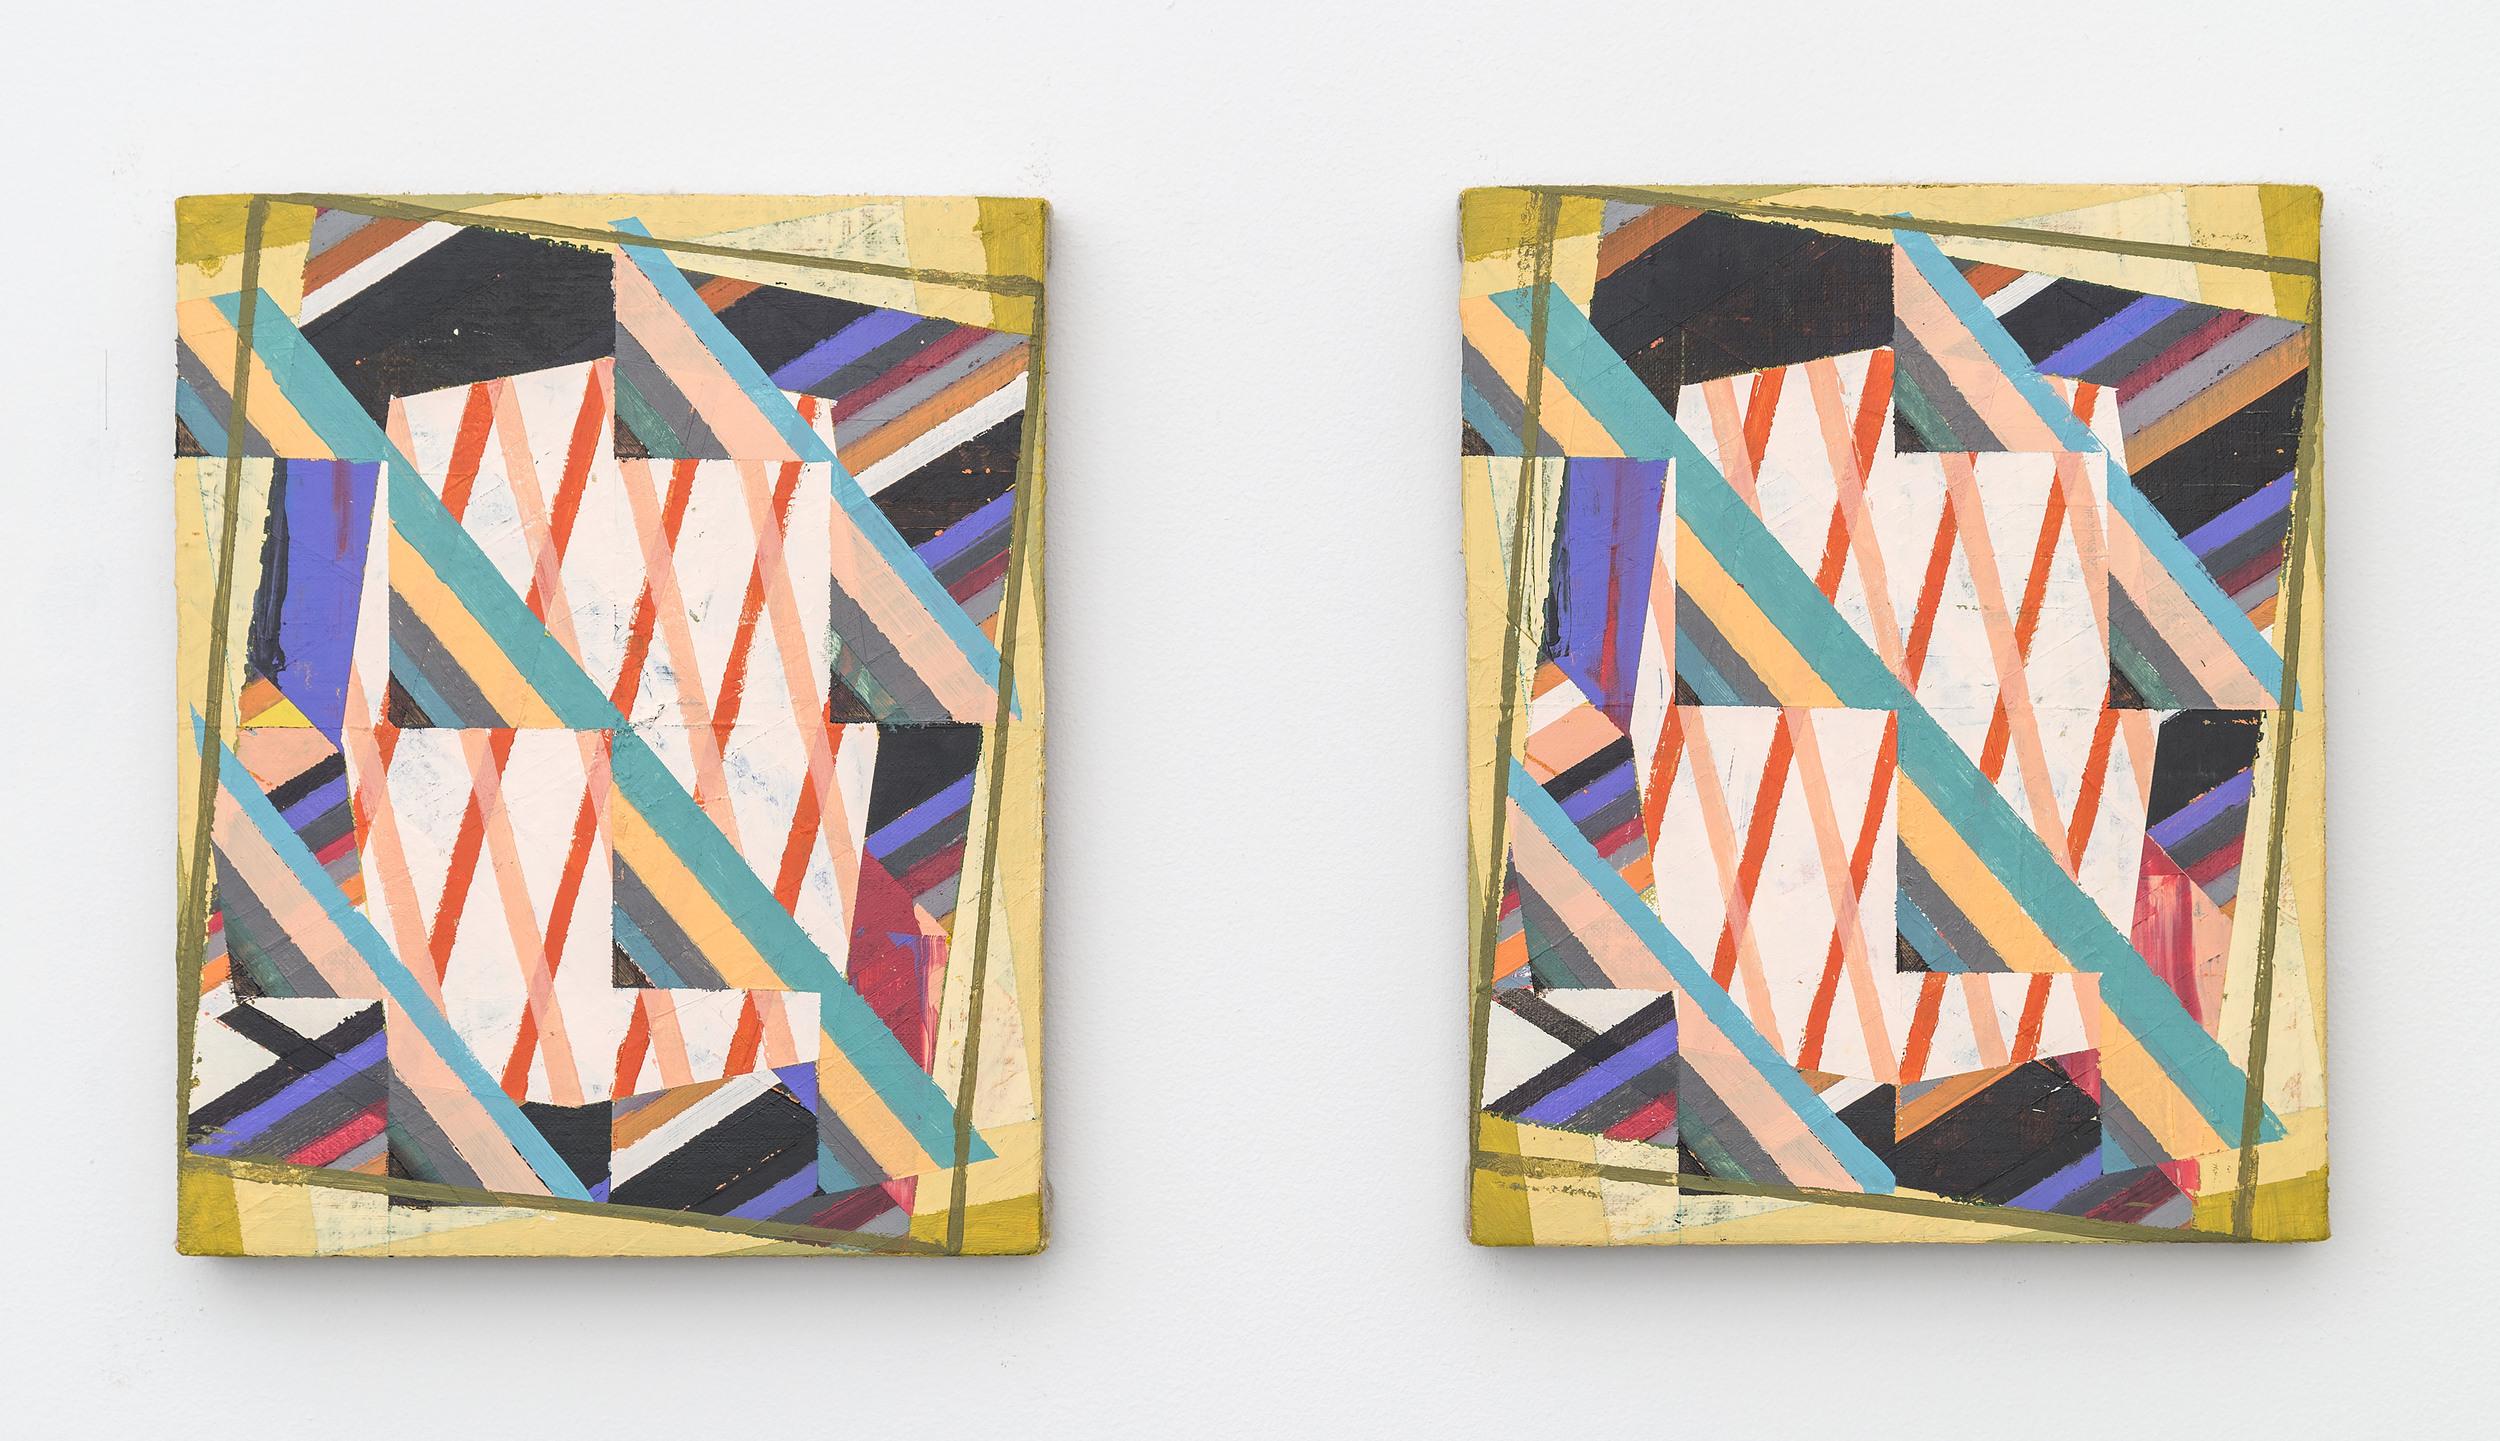 Two Left Feet and Vertigo (Diptych), 2016,Acrylic + colored pencil on linen over panels,10 x 8 inches each